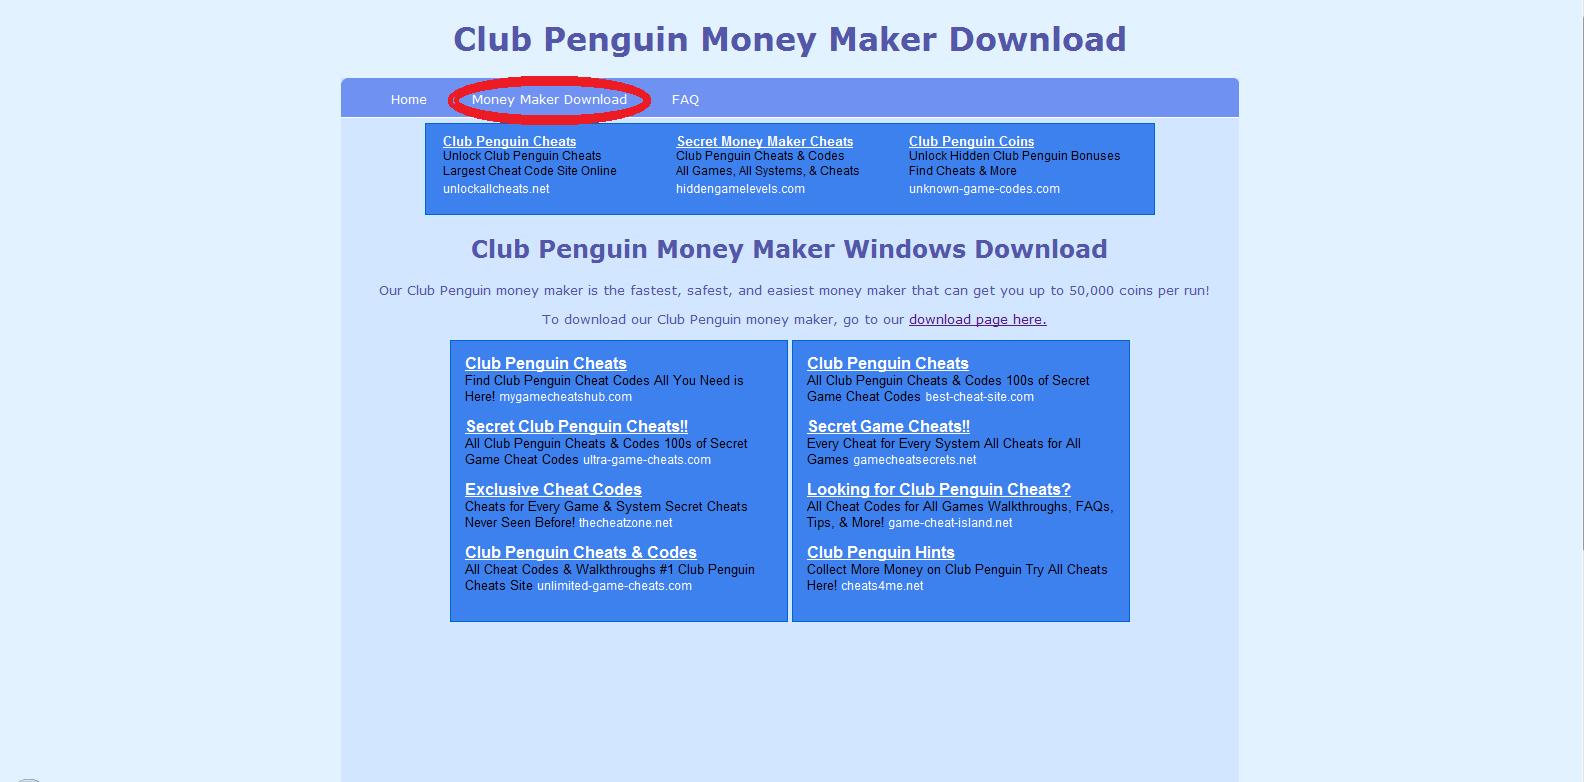 Www clubpenguin com membership free download.